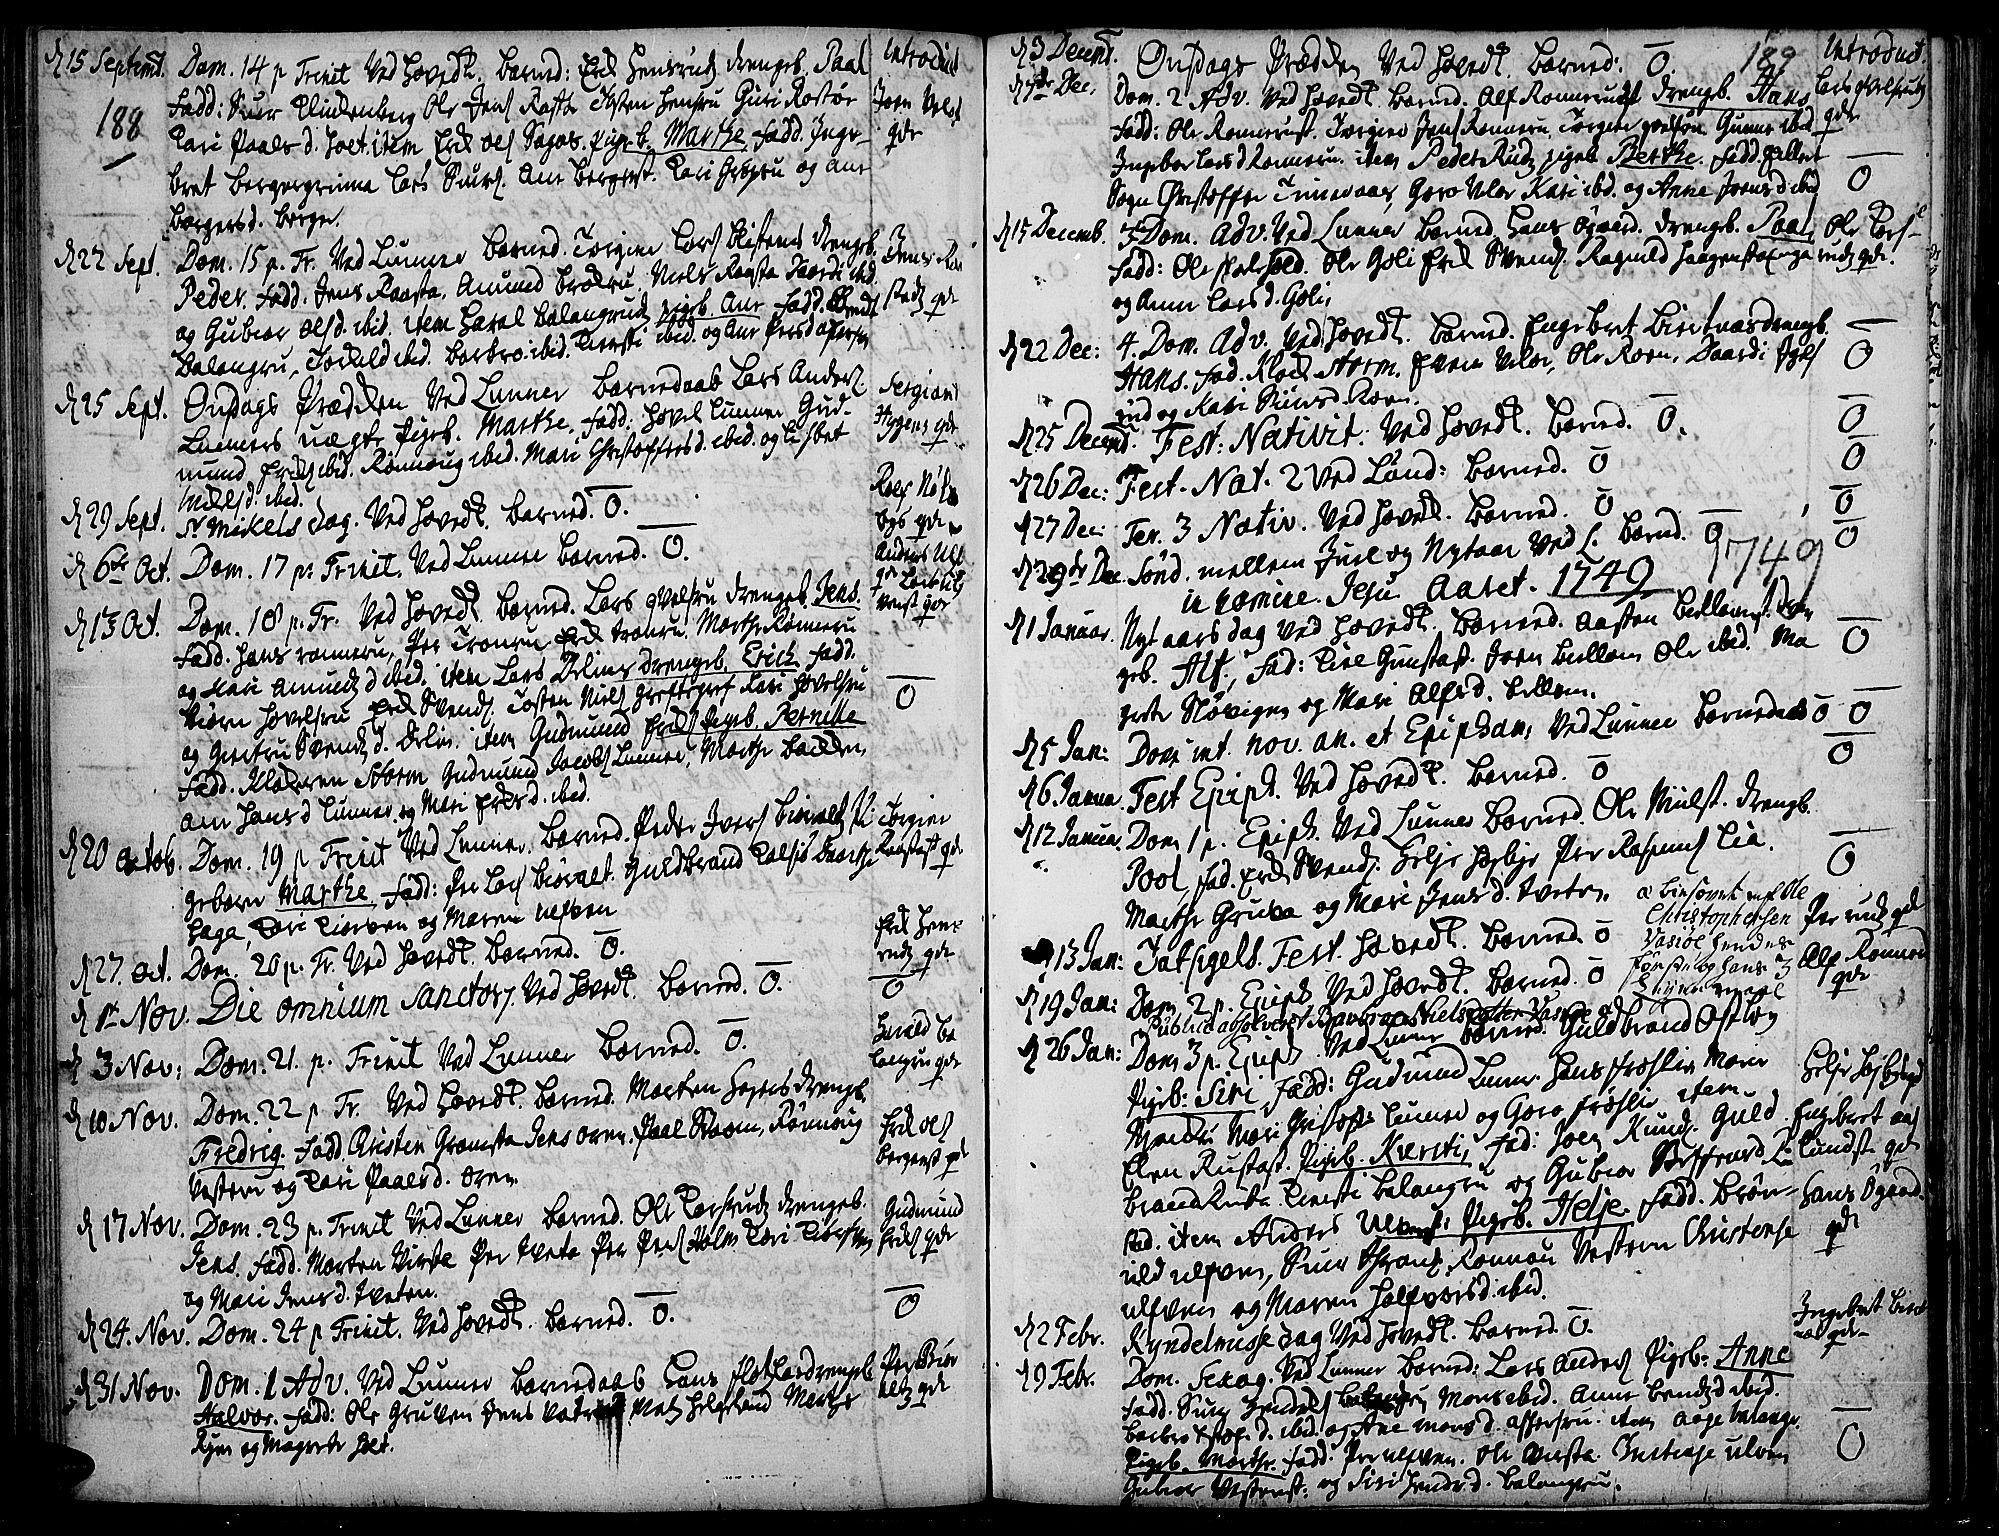 SAH, Jevnaker prestekontor, Ministerialbok nr. 2, 1725-1751, s. 188-189